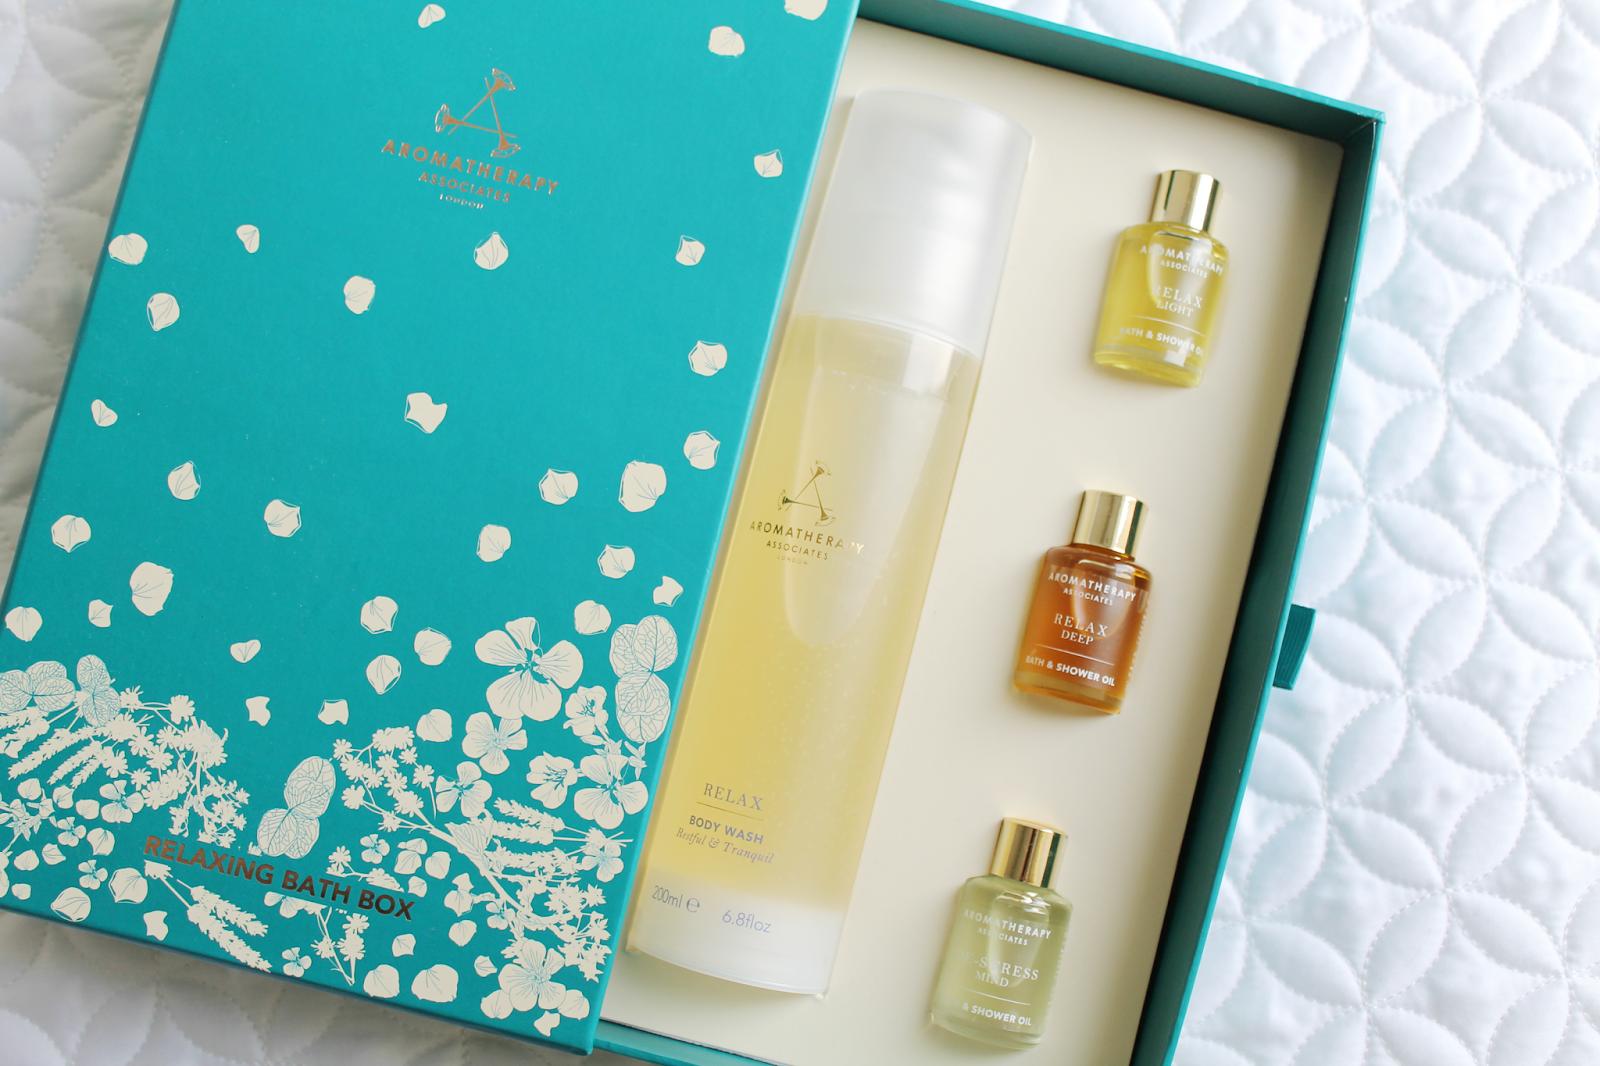 sweet electric.: Aromatherapy Associates Relaxing Bath Box Review &...